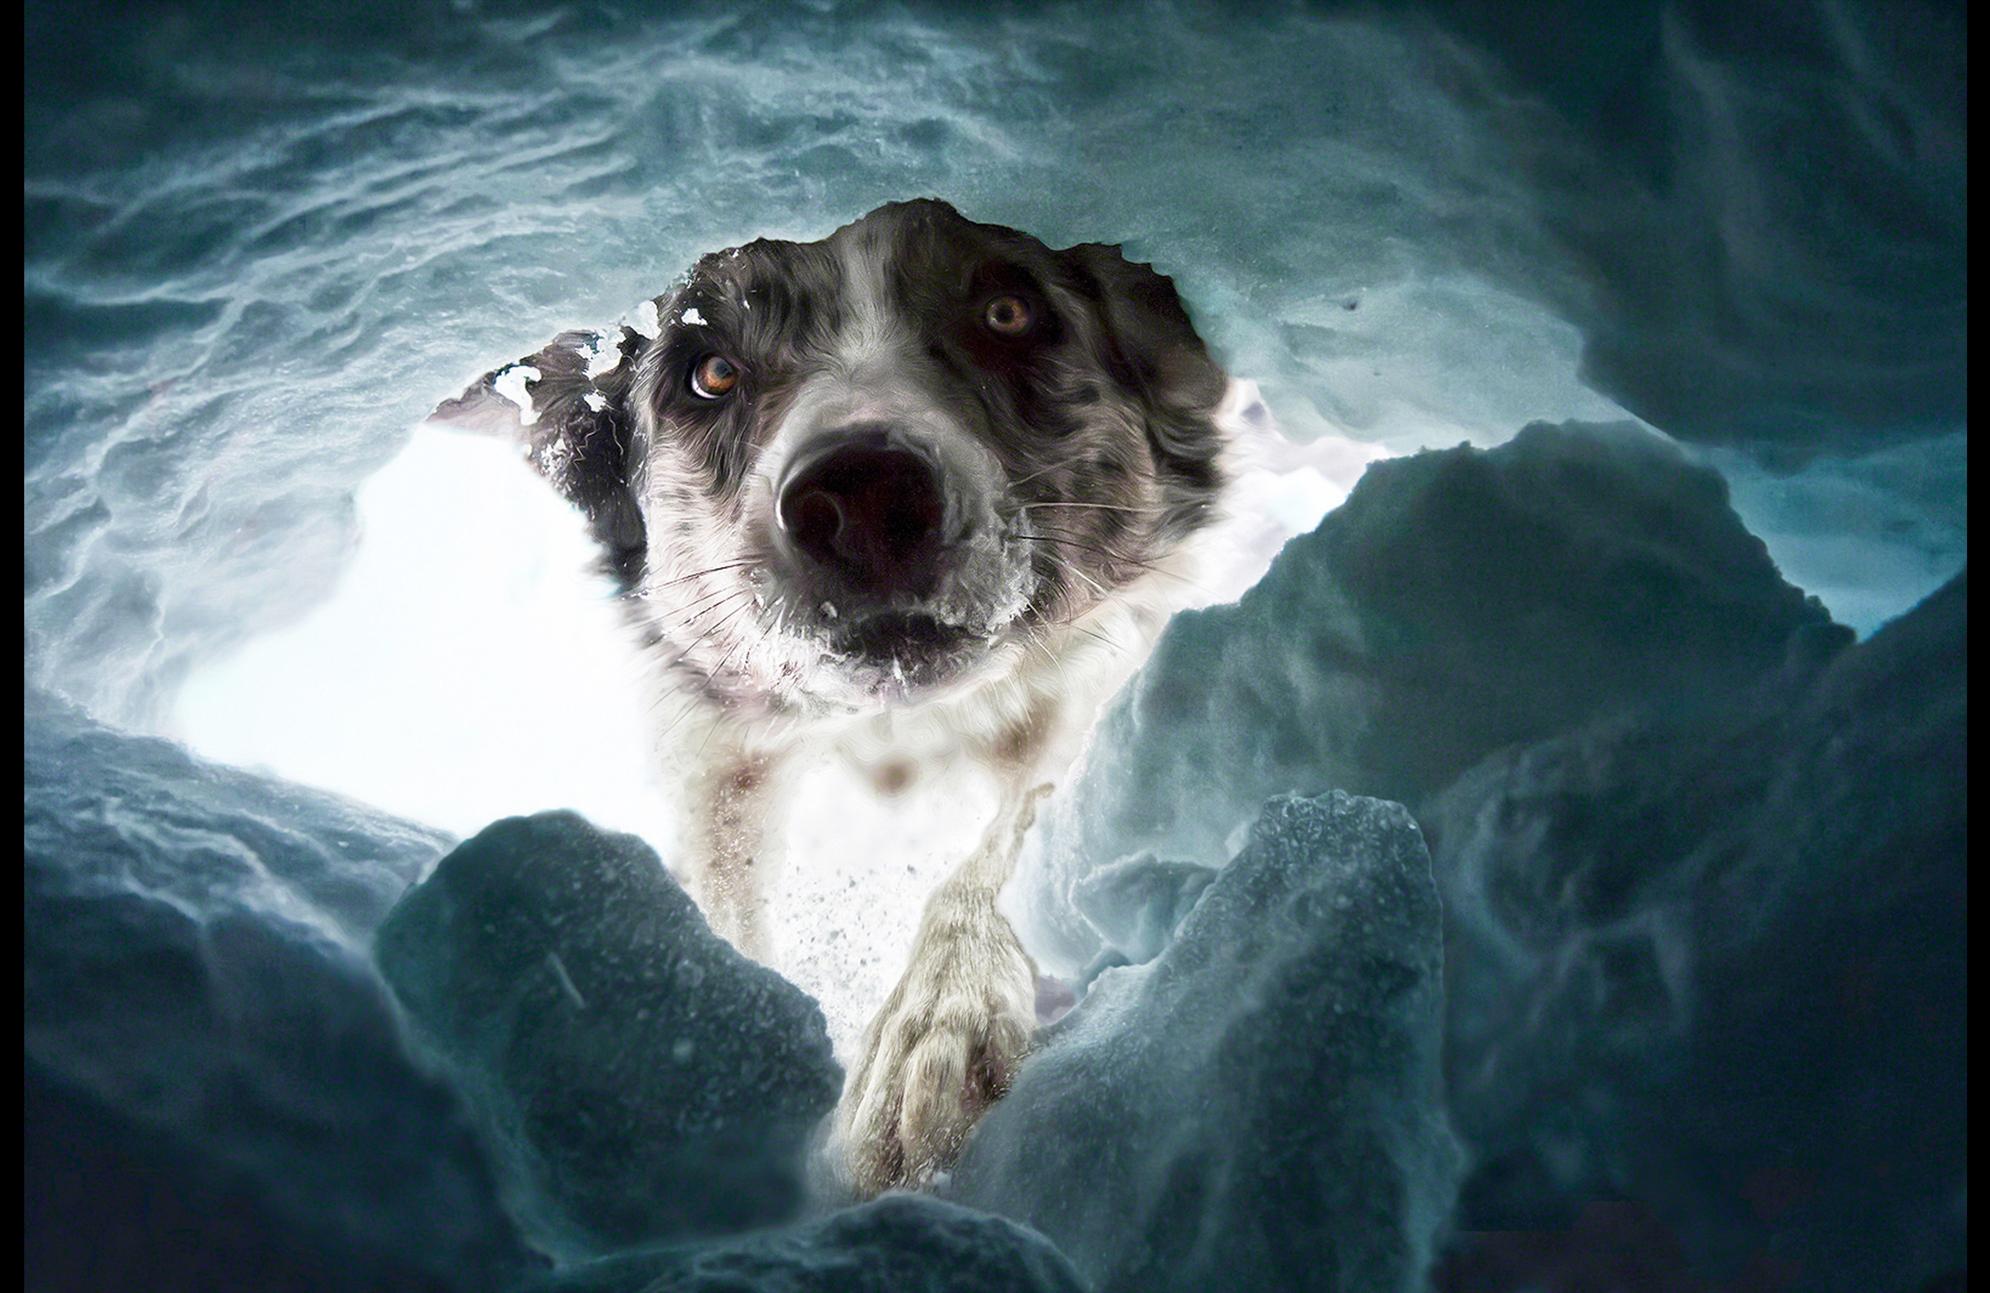 CreativeArtView_RescuedogStart2